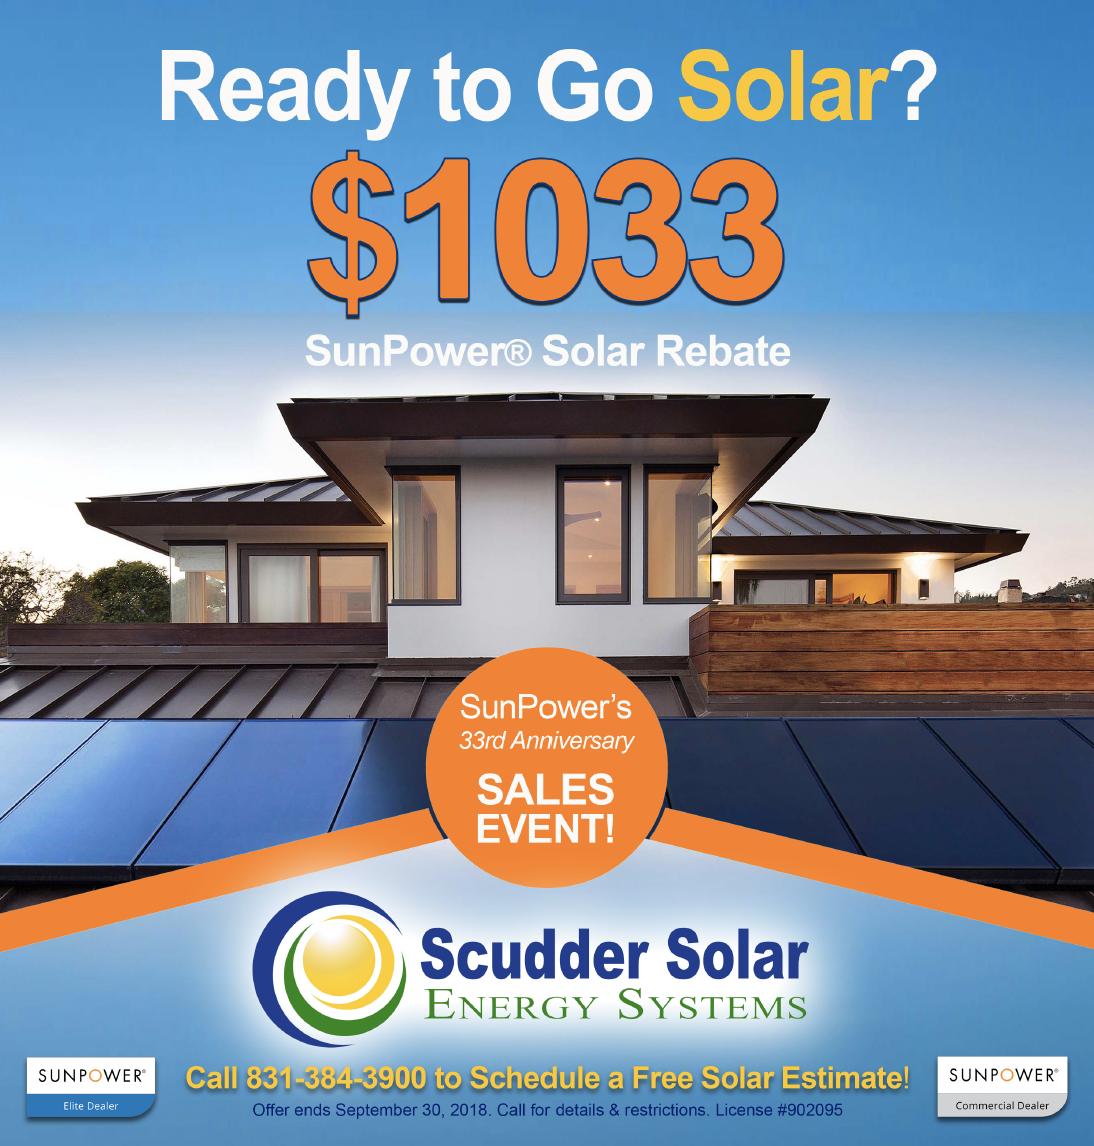 $1033 SunPower Rebate – Scudder Solar Energy Systems Blog